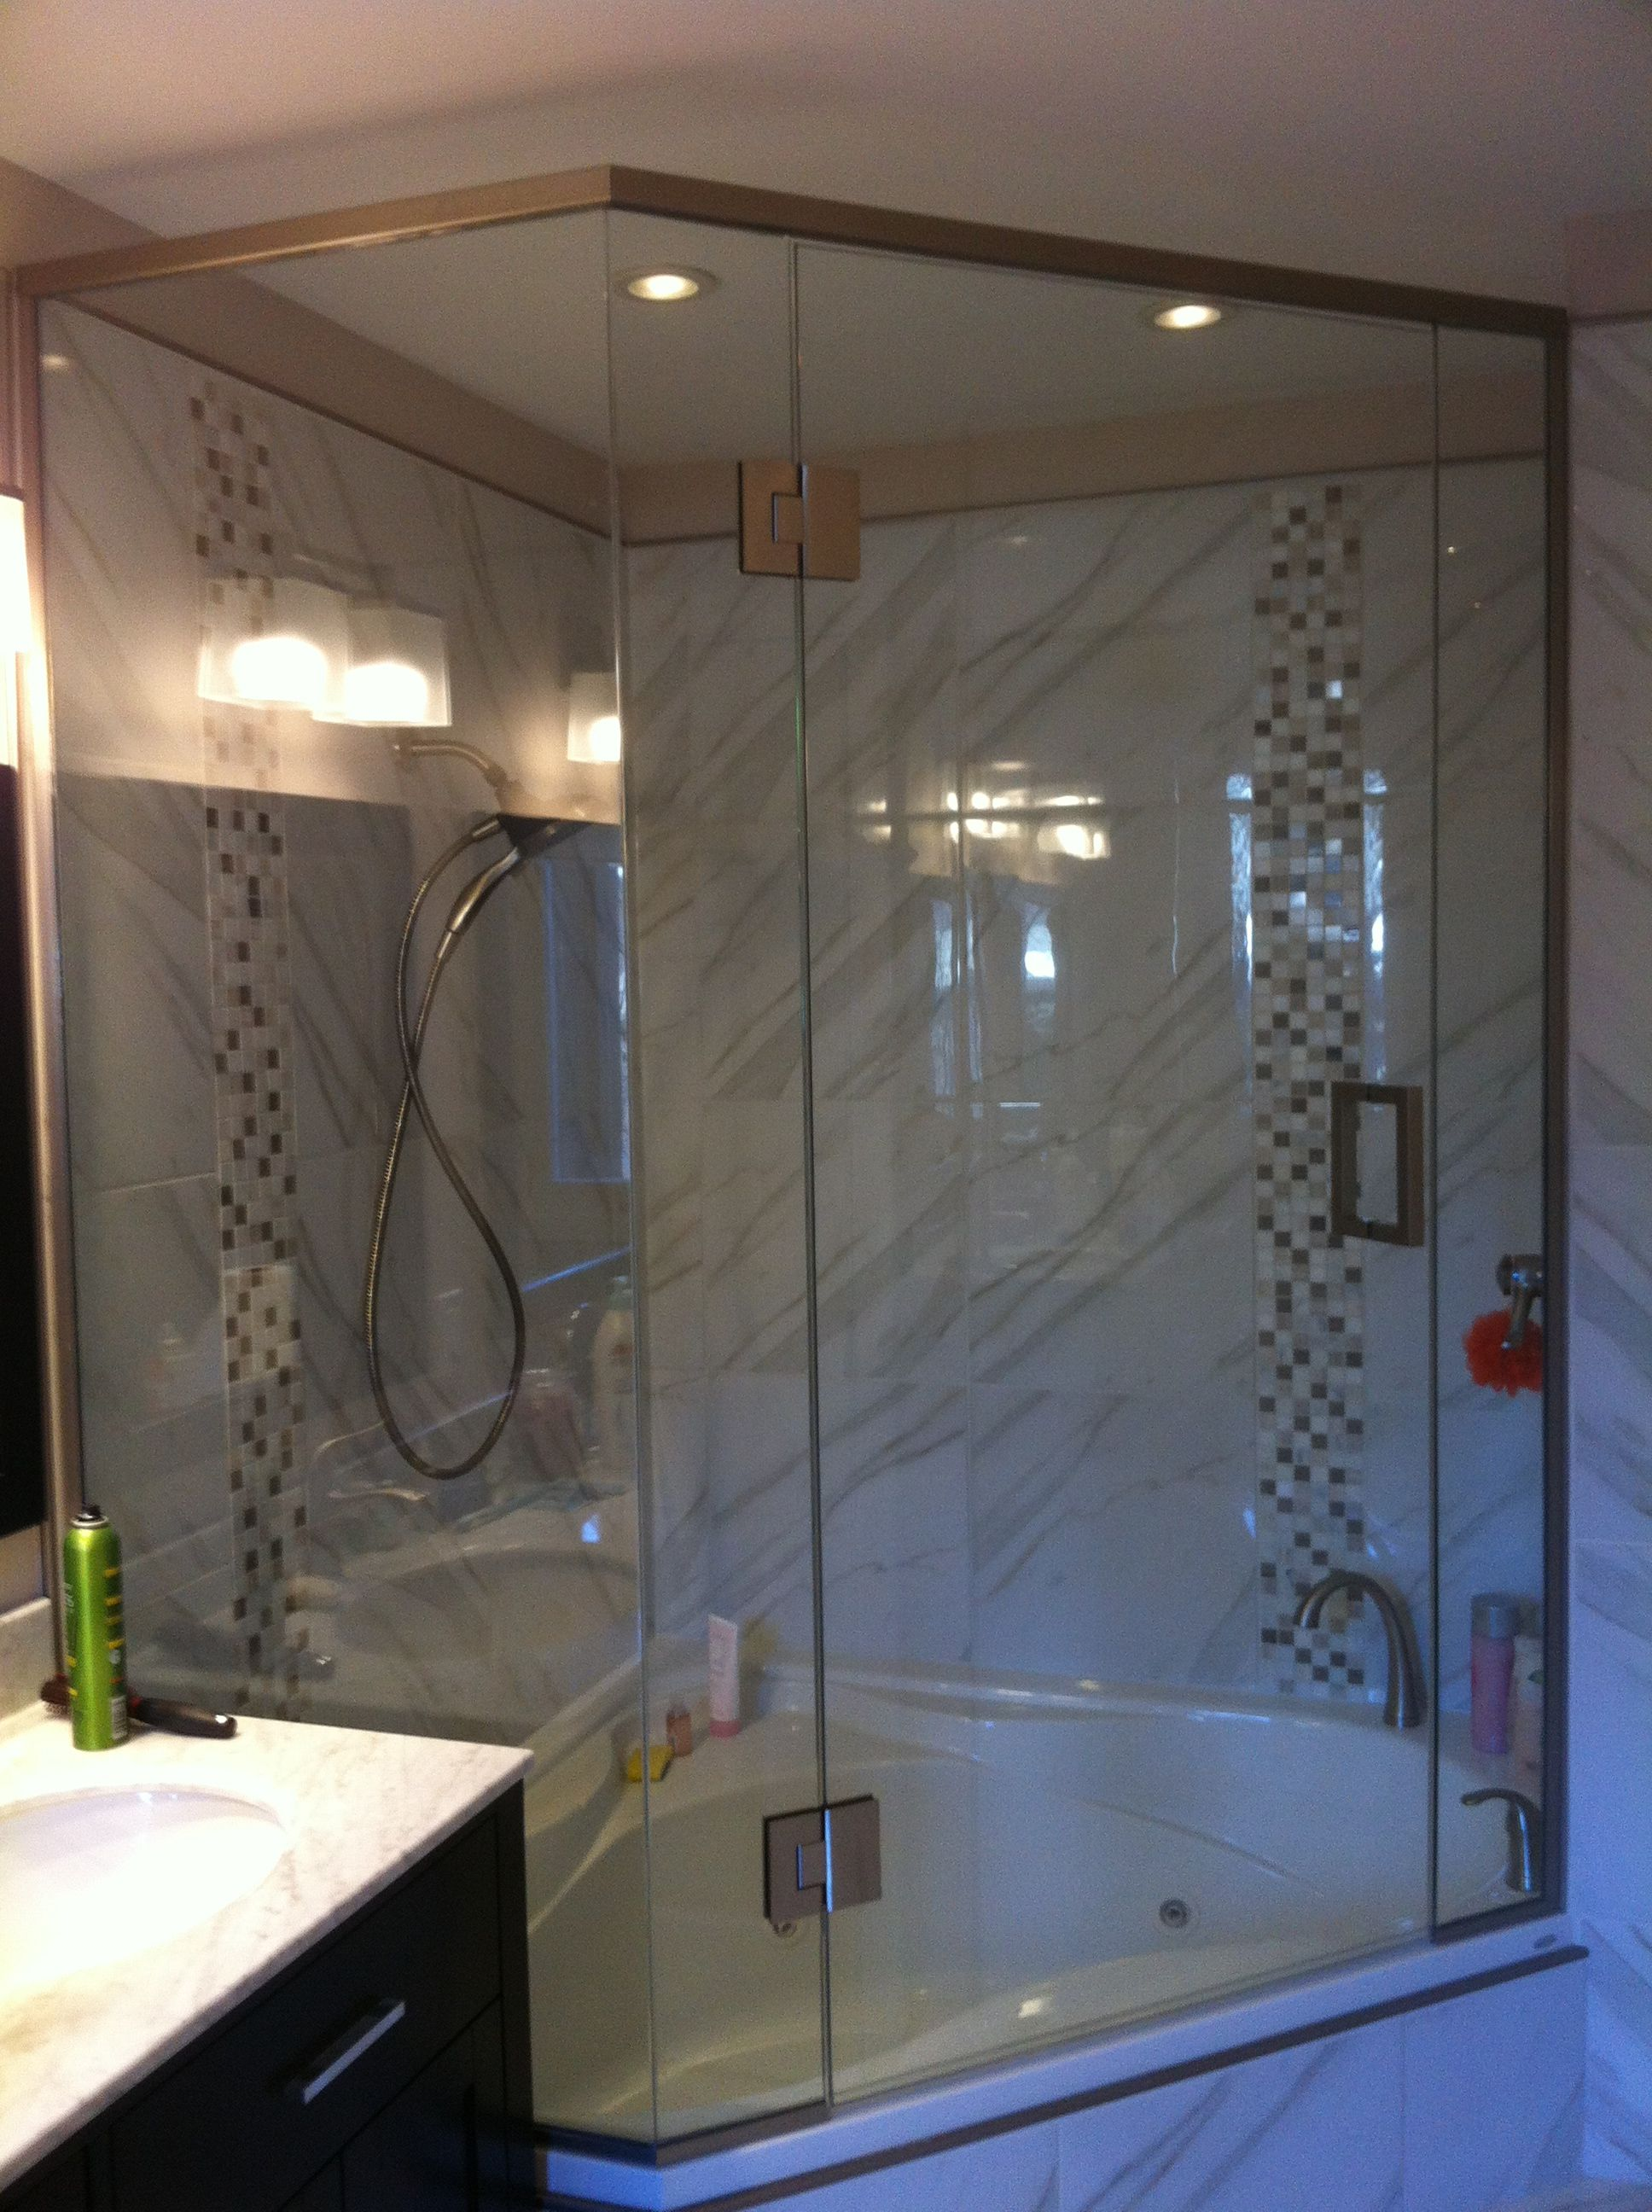 Shower Enclosure Above Neo Angle Jacuzzi Tub Square Hardware